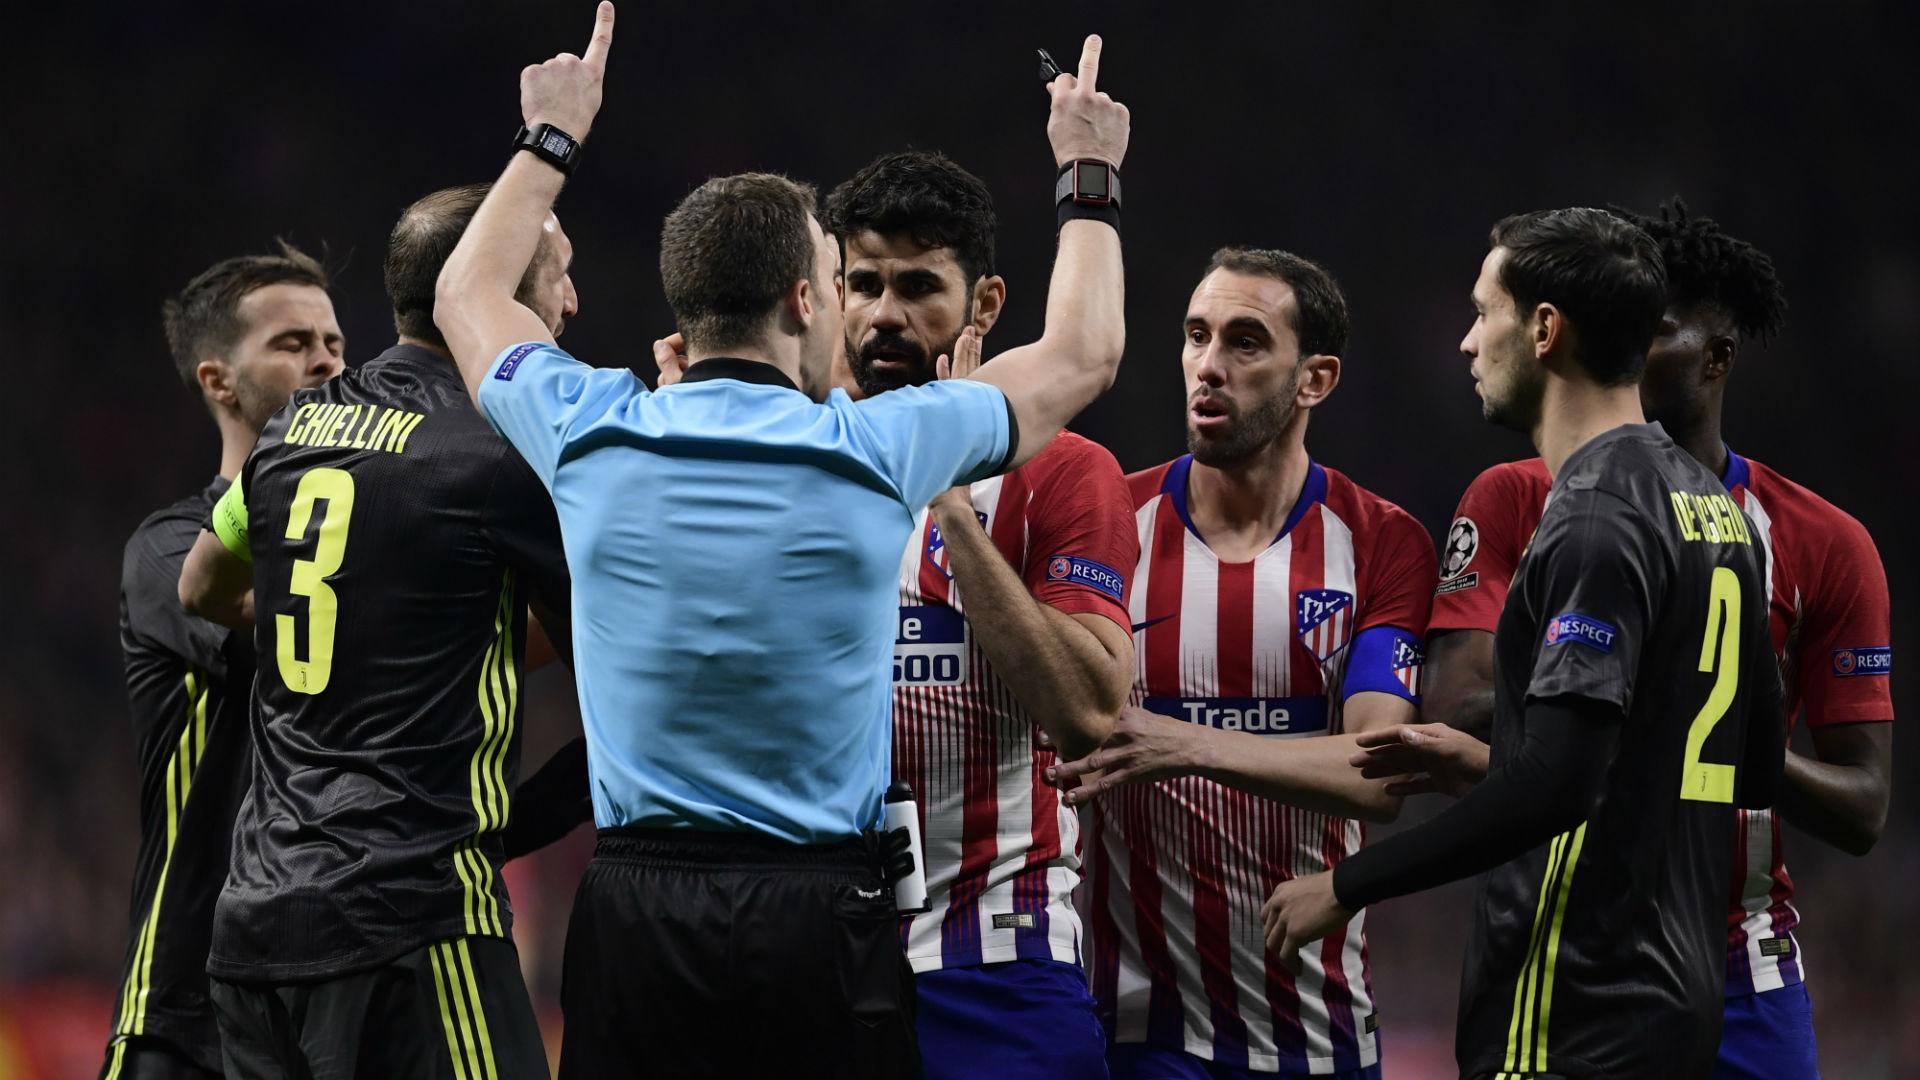 Dipermak Atletico 2-0, Peluang Juve Lolos di Liga Champion Menipis